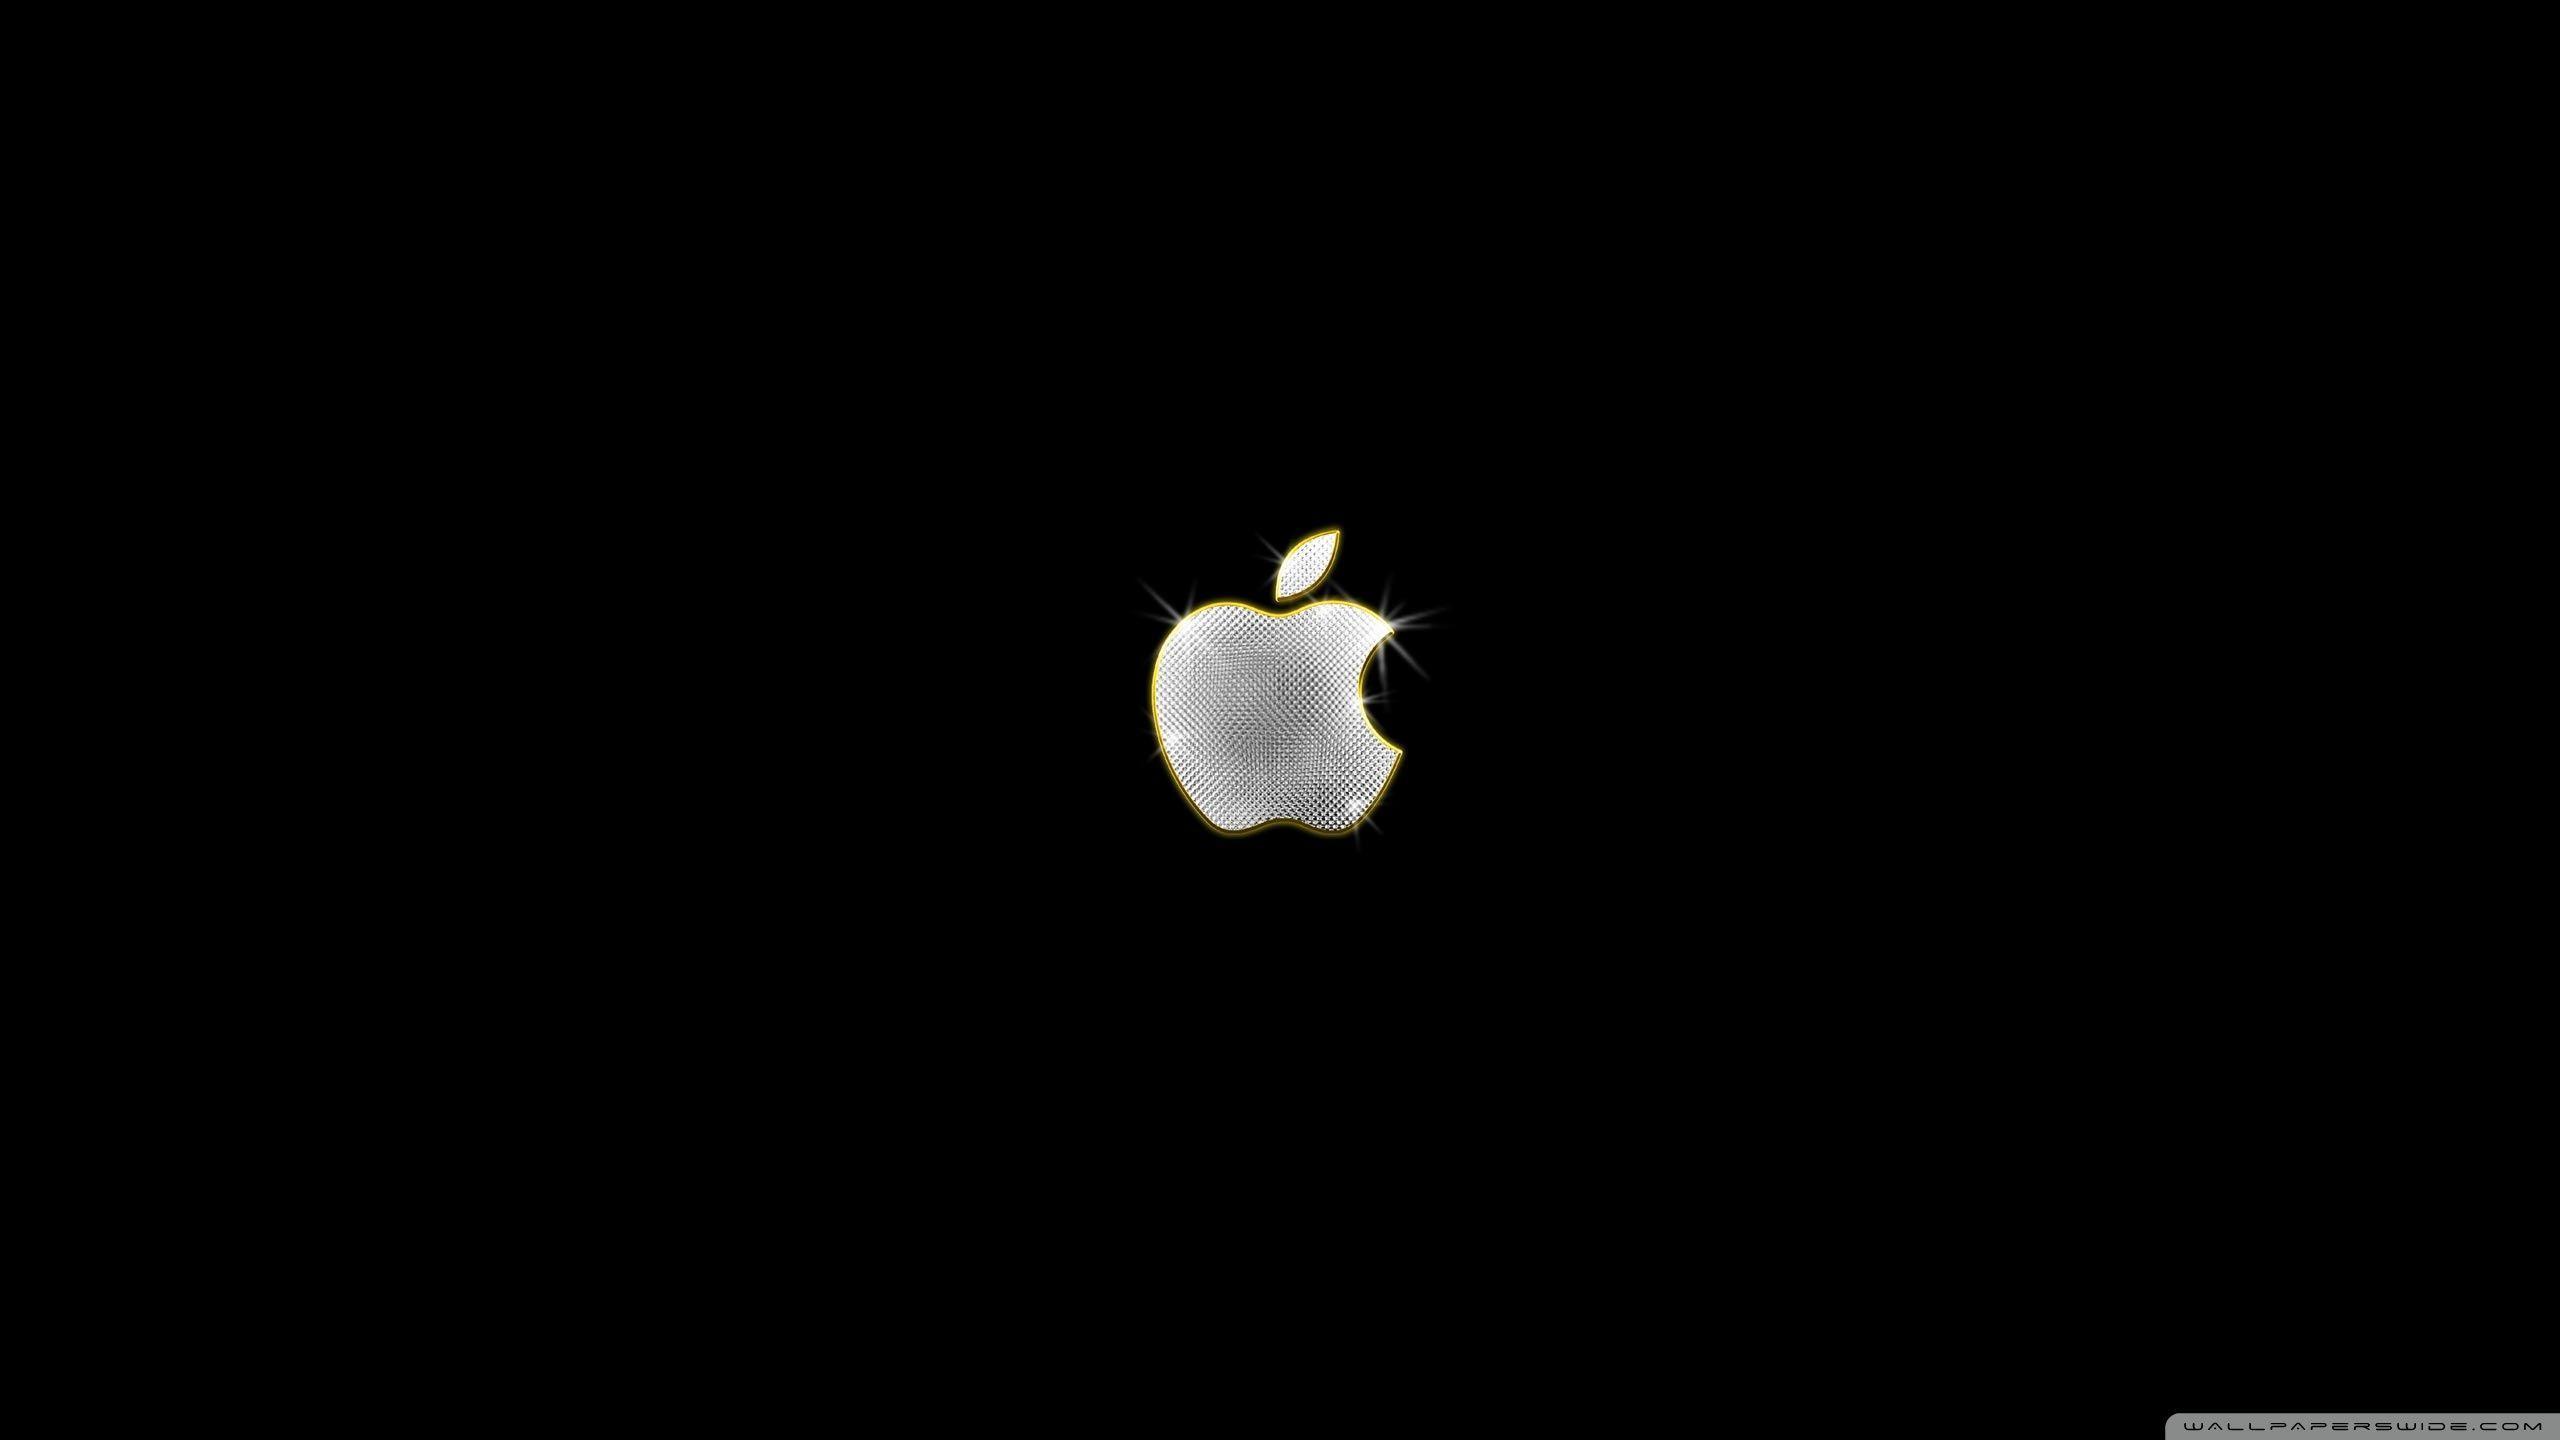 Apple Logo Wallpapers Hd 1080p Wallpaper Cave